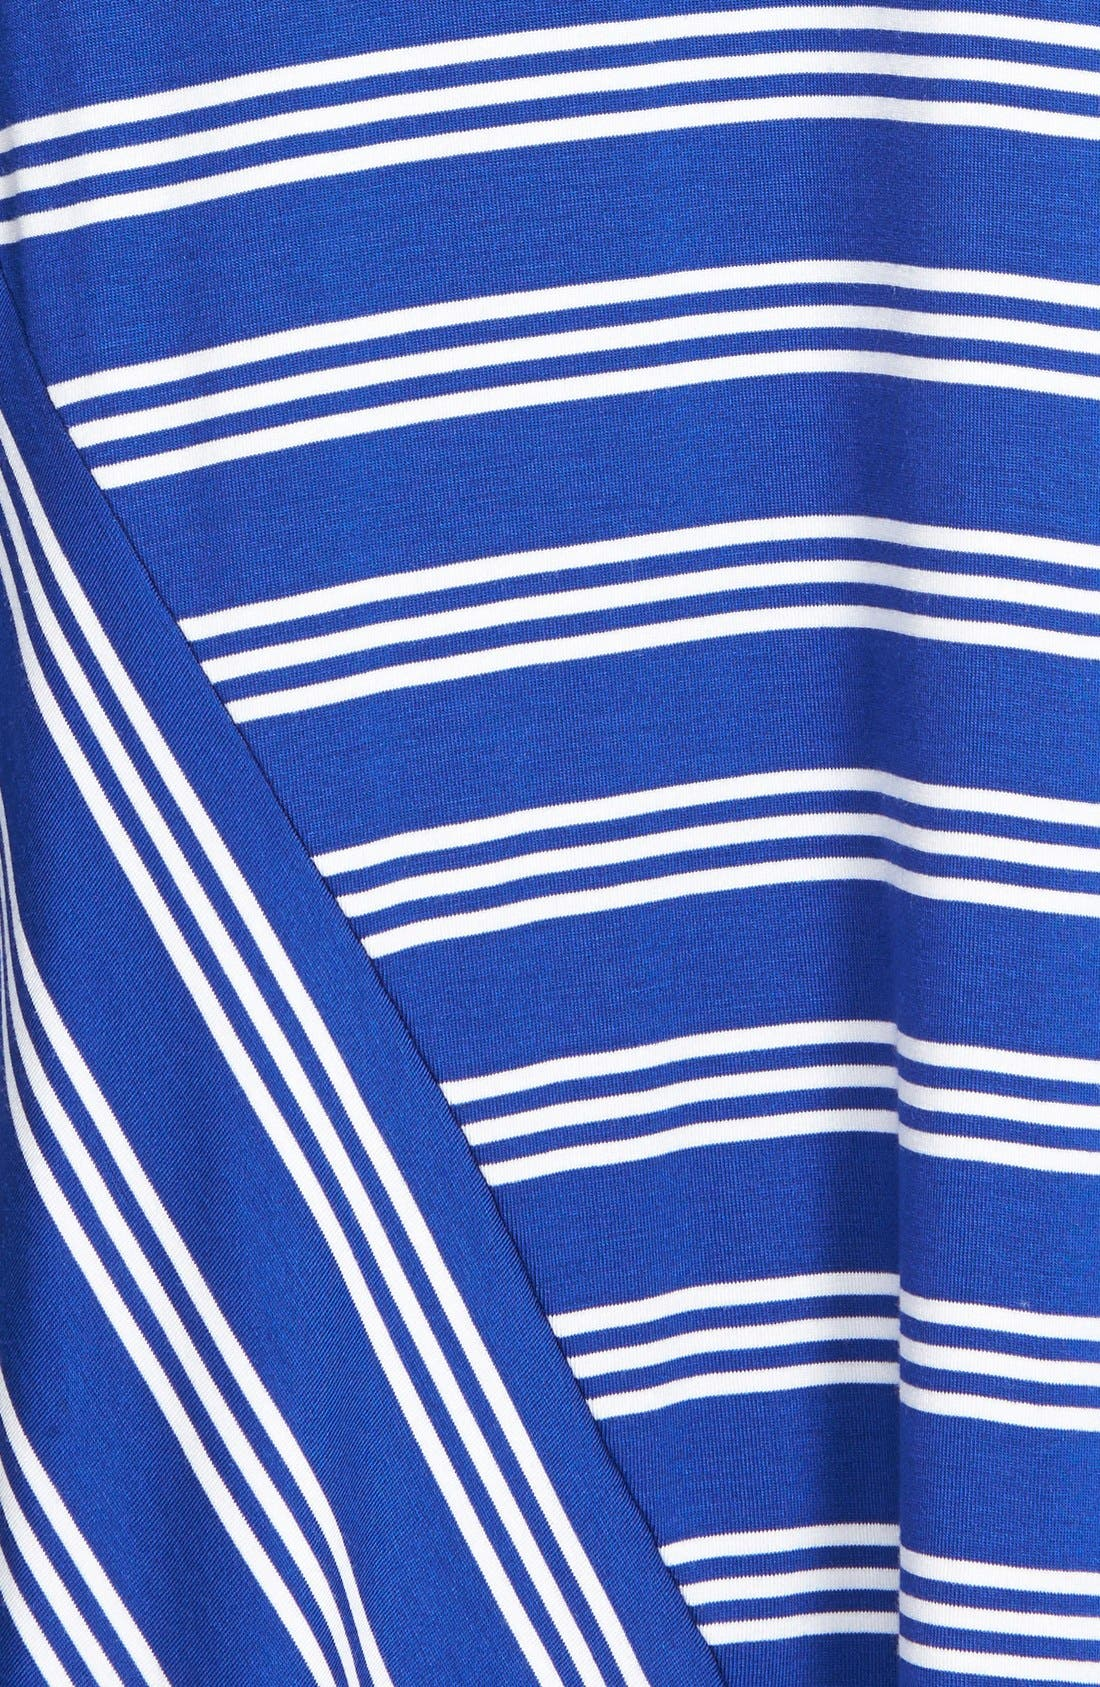 Alternate Image 3  - kensie Stripe Stretch Knit Maxi Skirt